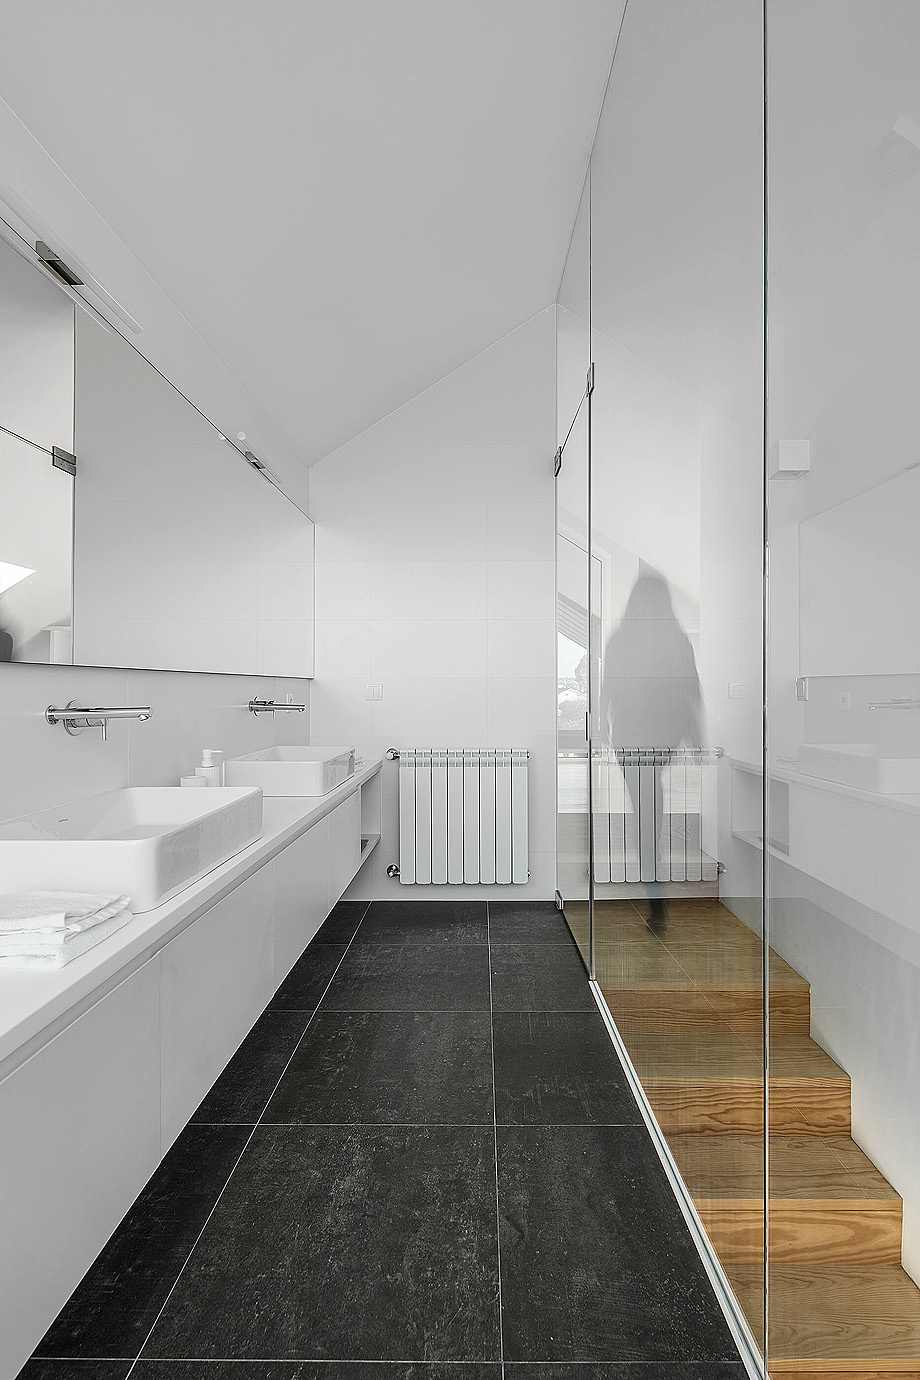 casa do arco de frari architecture network - foto ivo tavares (36)